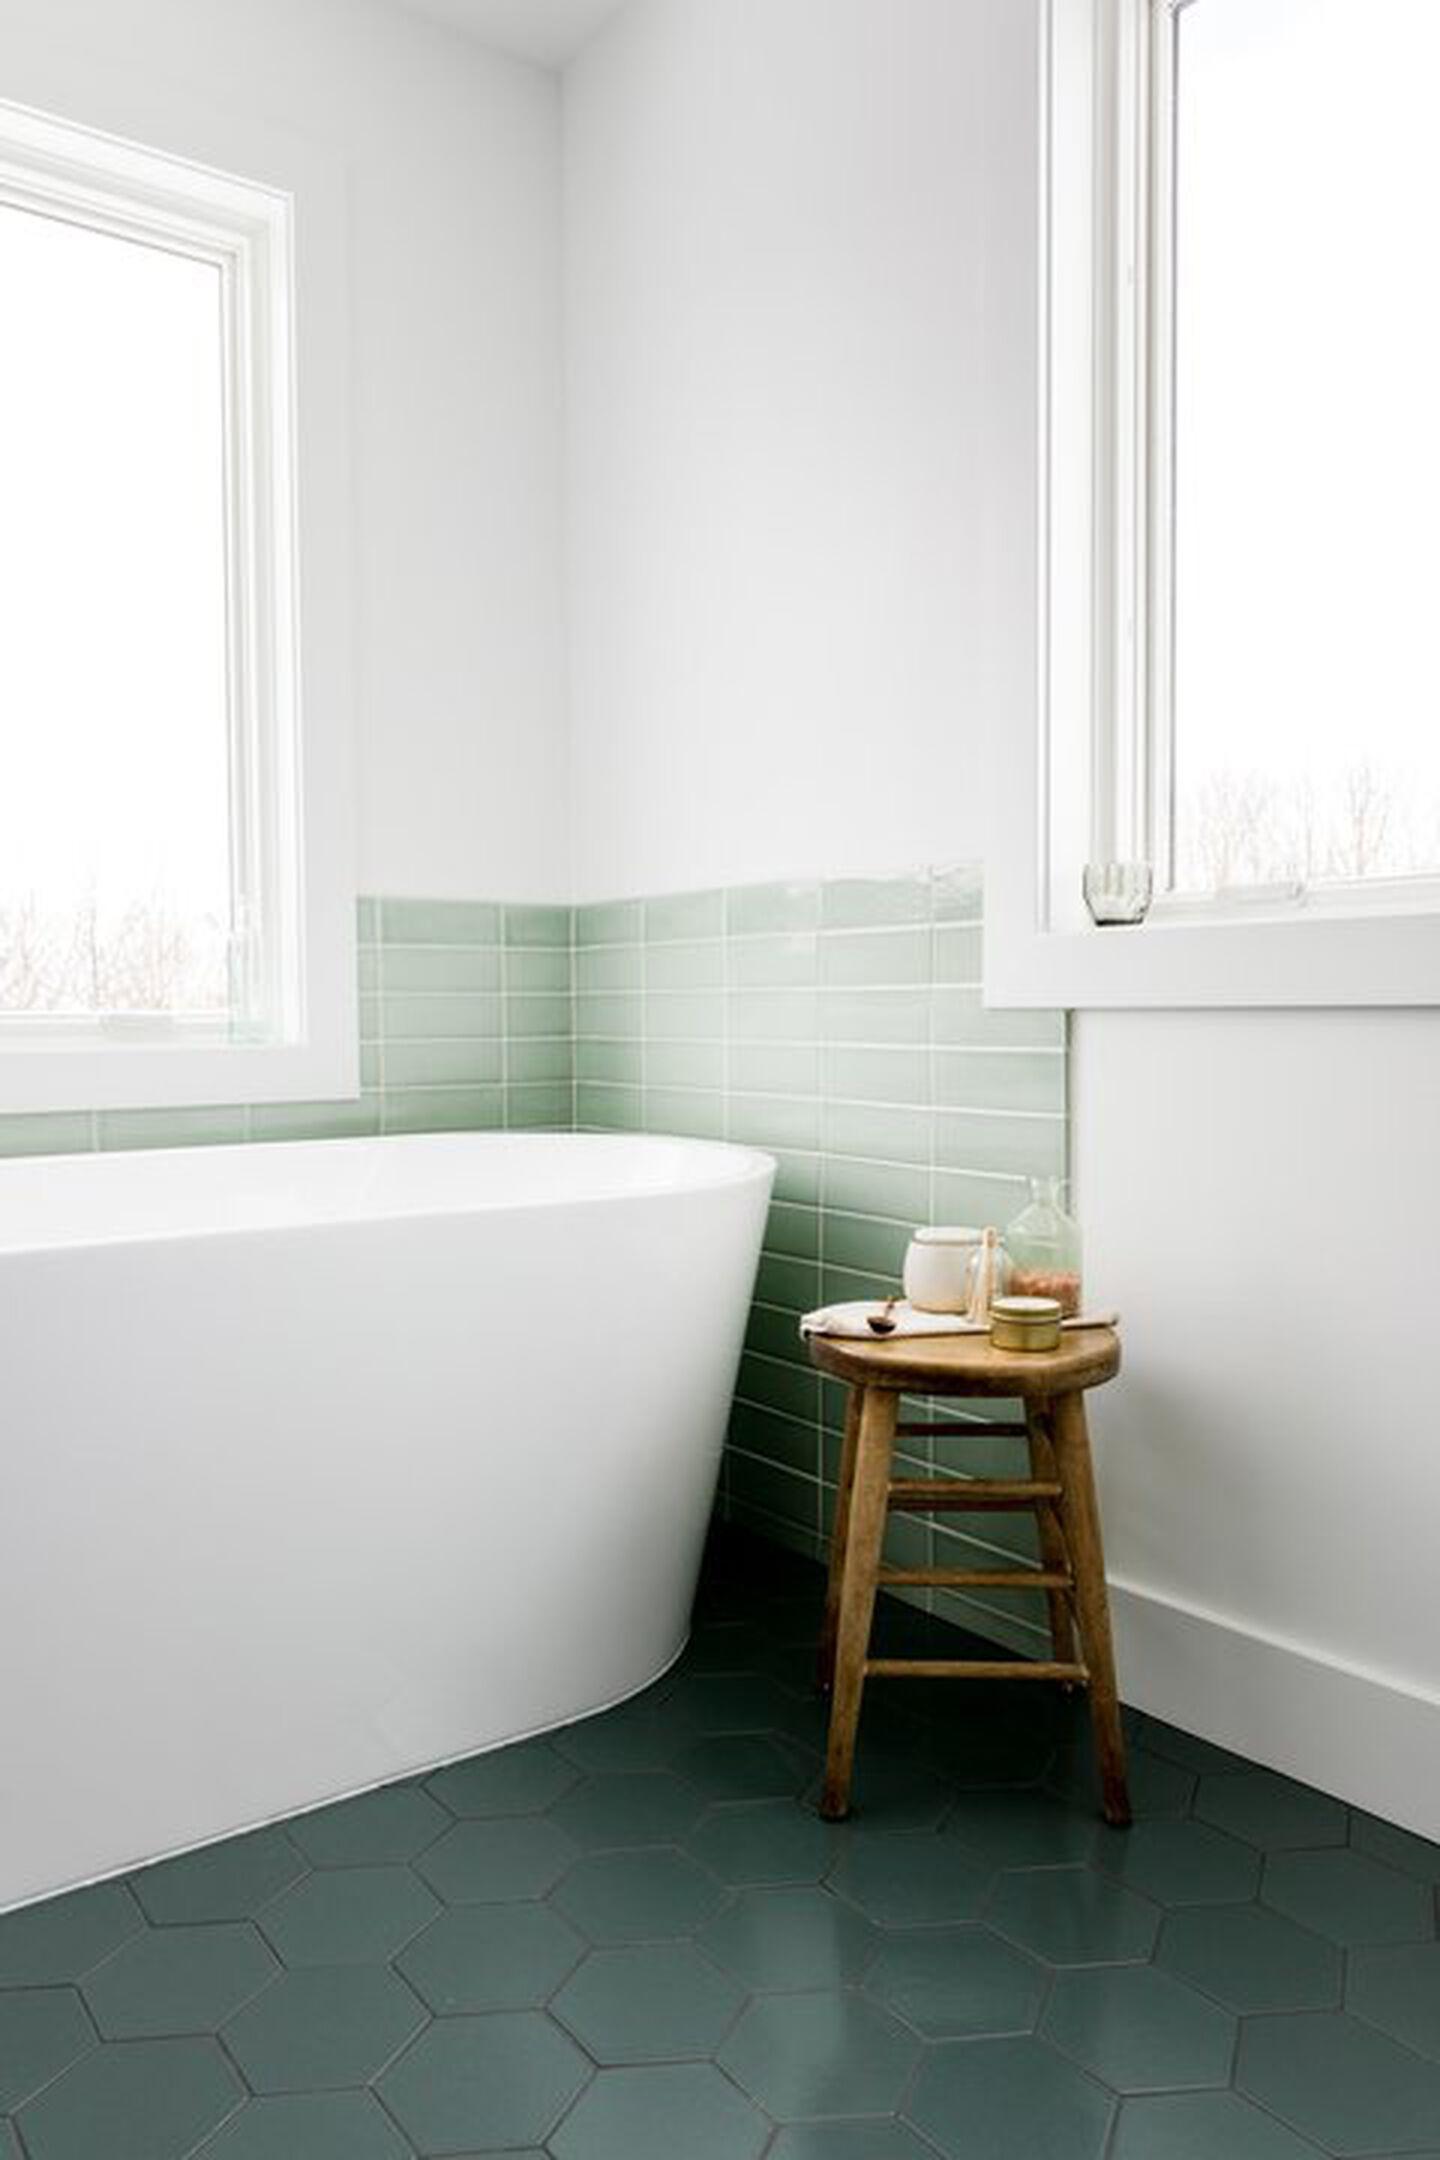 Linea freestanding bath